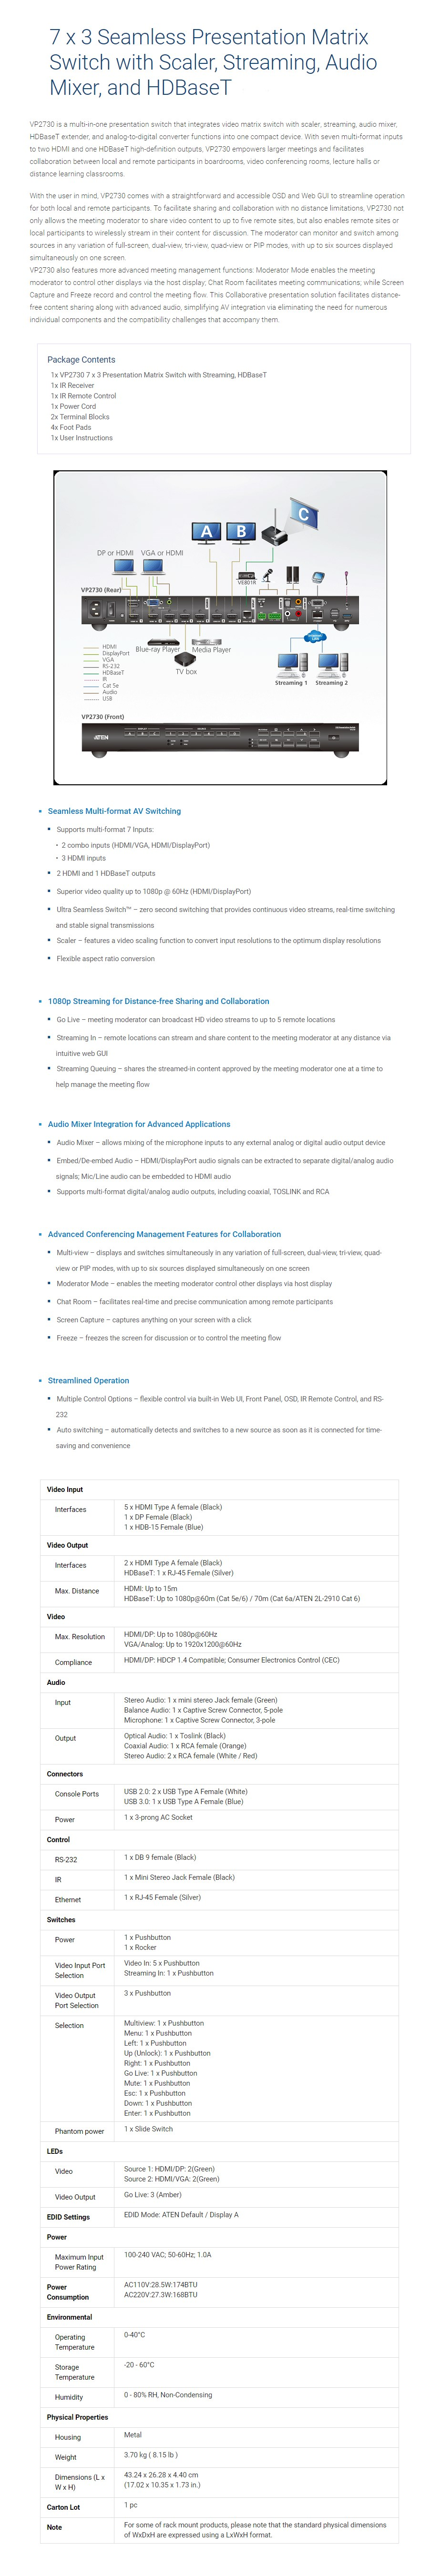 ATEN VP2730 1080p 7x3 Presentation Matrix Switch with Scalar - Desktop Overview 1